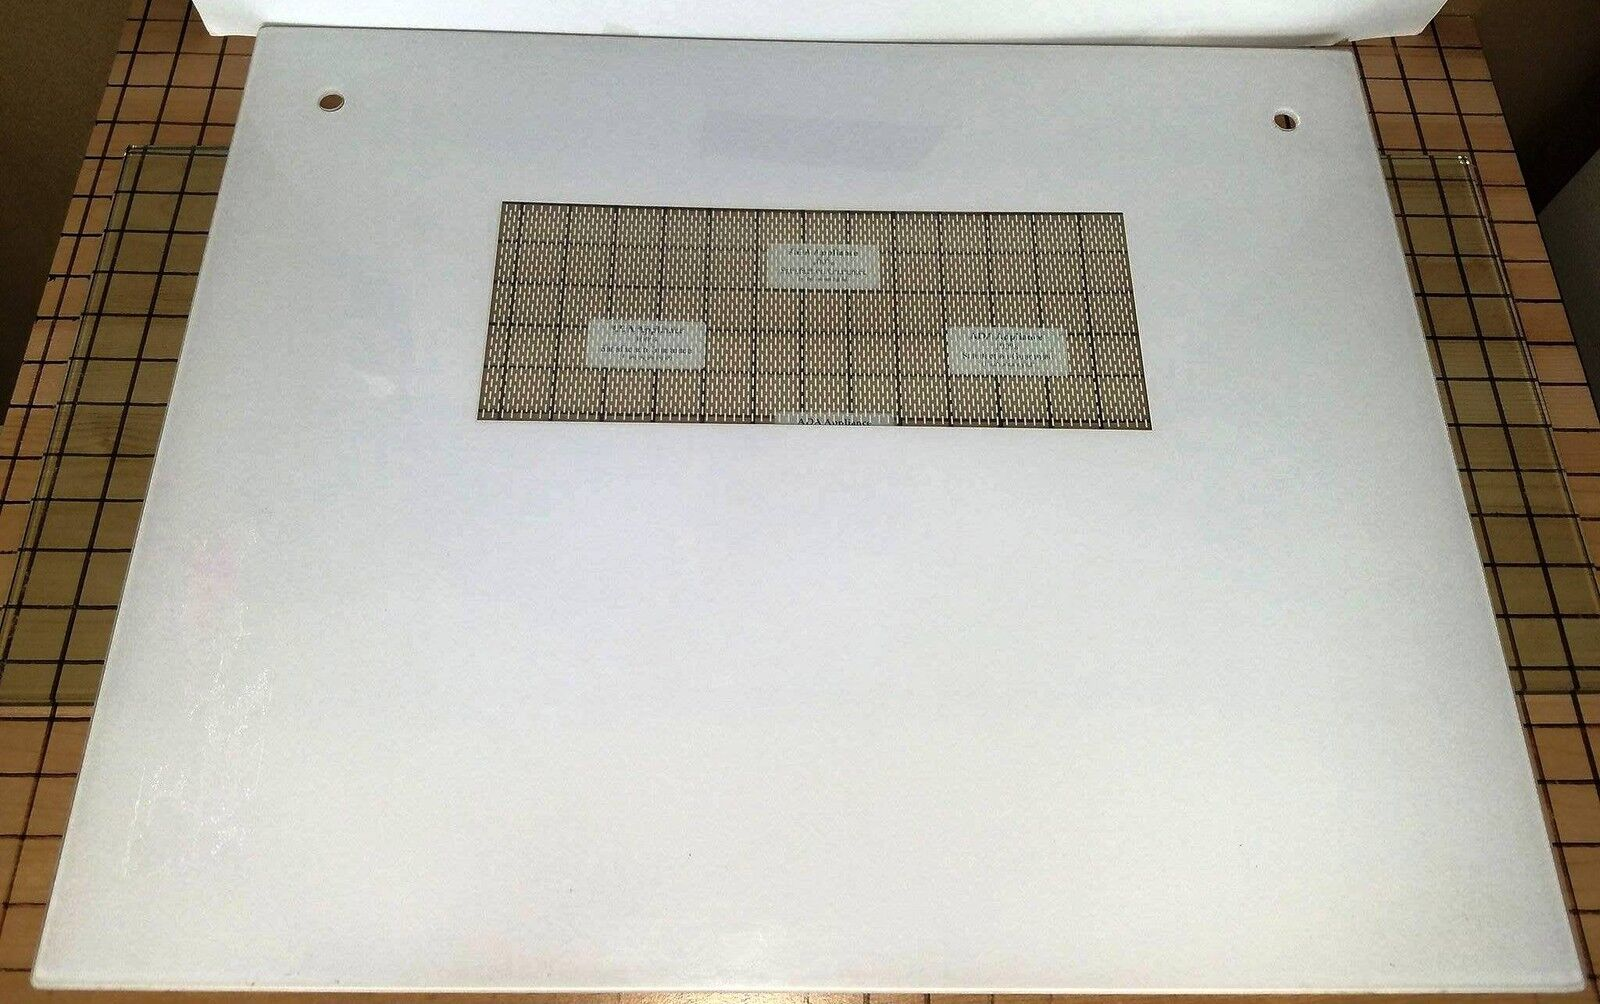 Thermador CT227 Door Panel - Weiß 00484737, 1051060  SATISF GUAR FREE EXPD SHIP